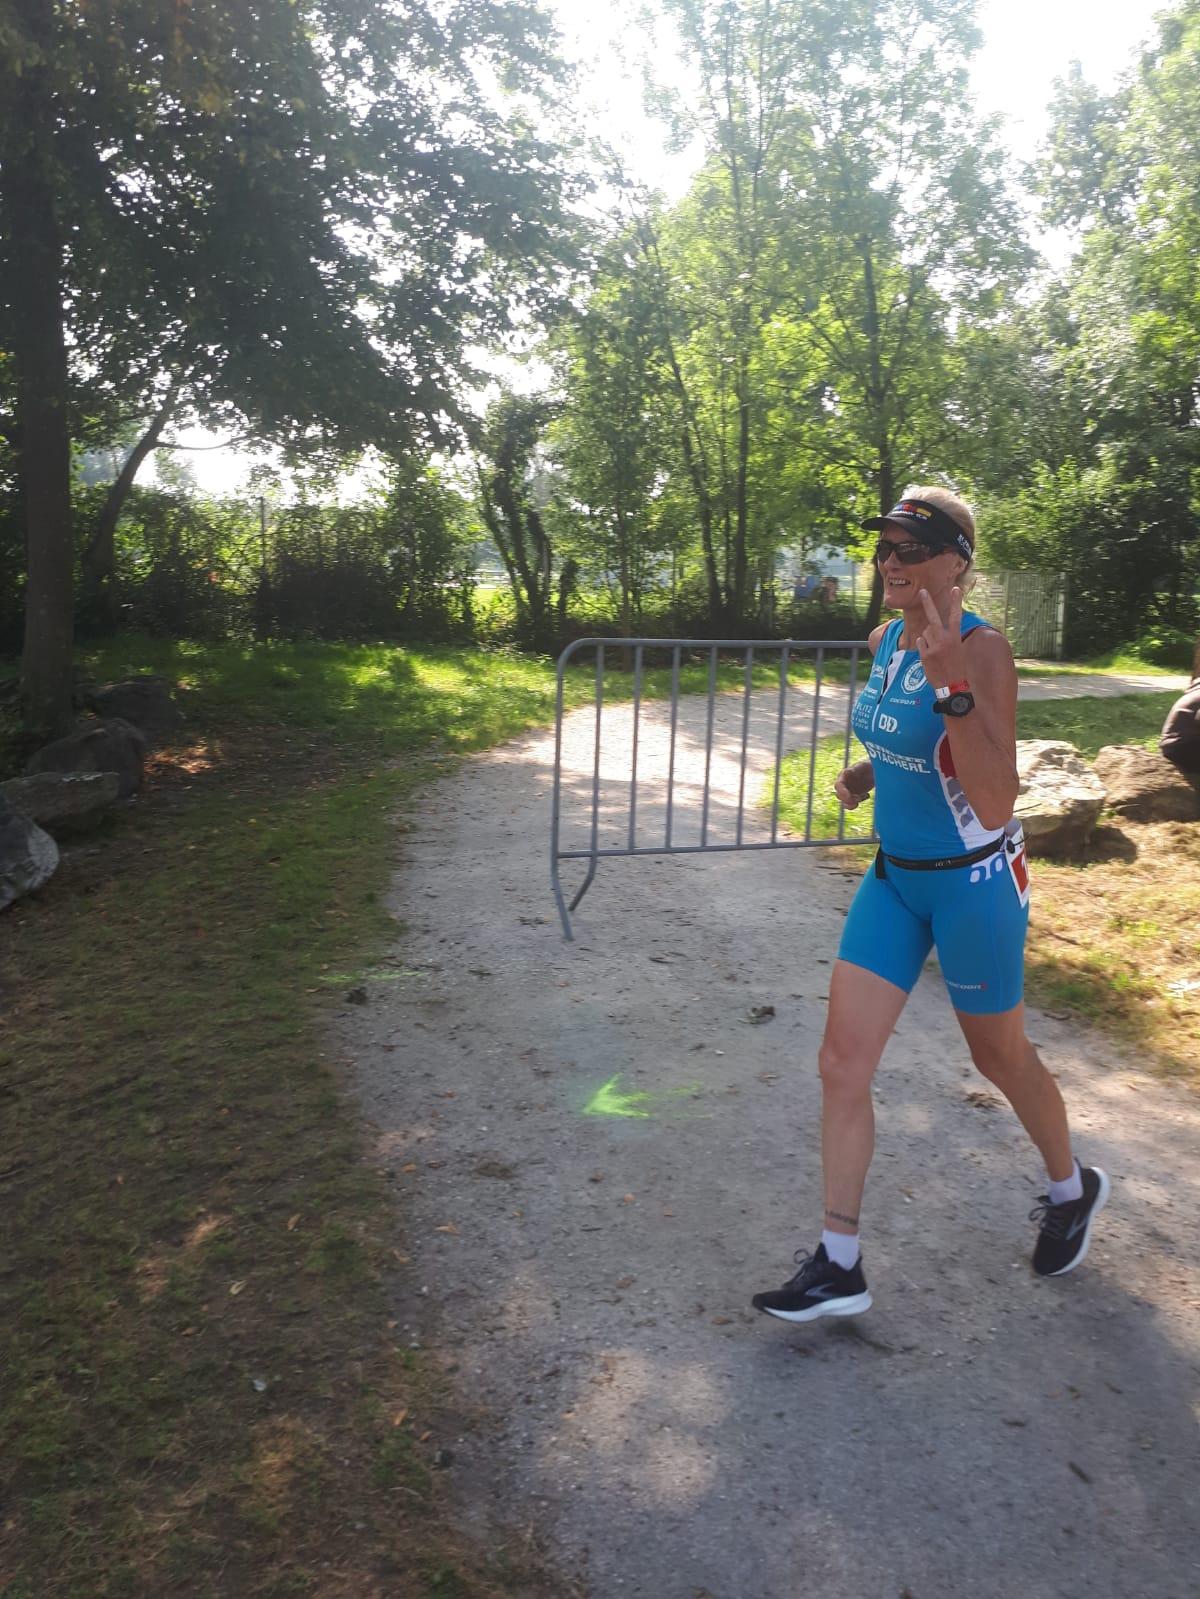 Triathlon -rtr-weiz-WhatsApp-Image-2020-09-13-at-12.58.36-Aloha Tri Traun 2020